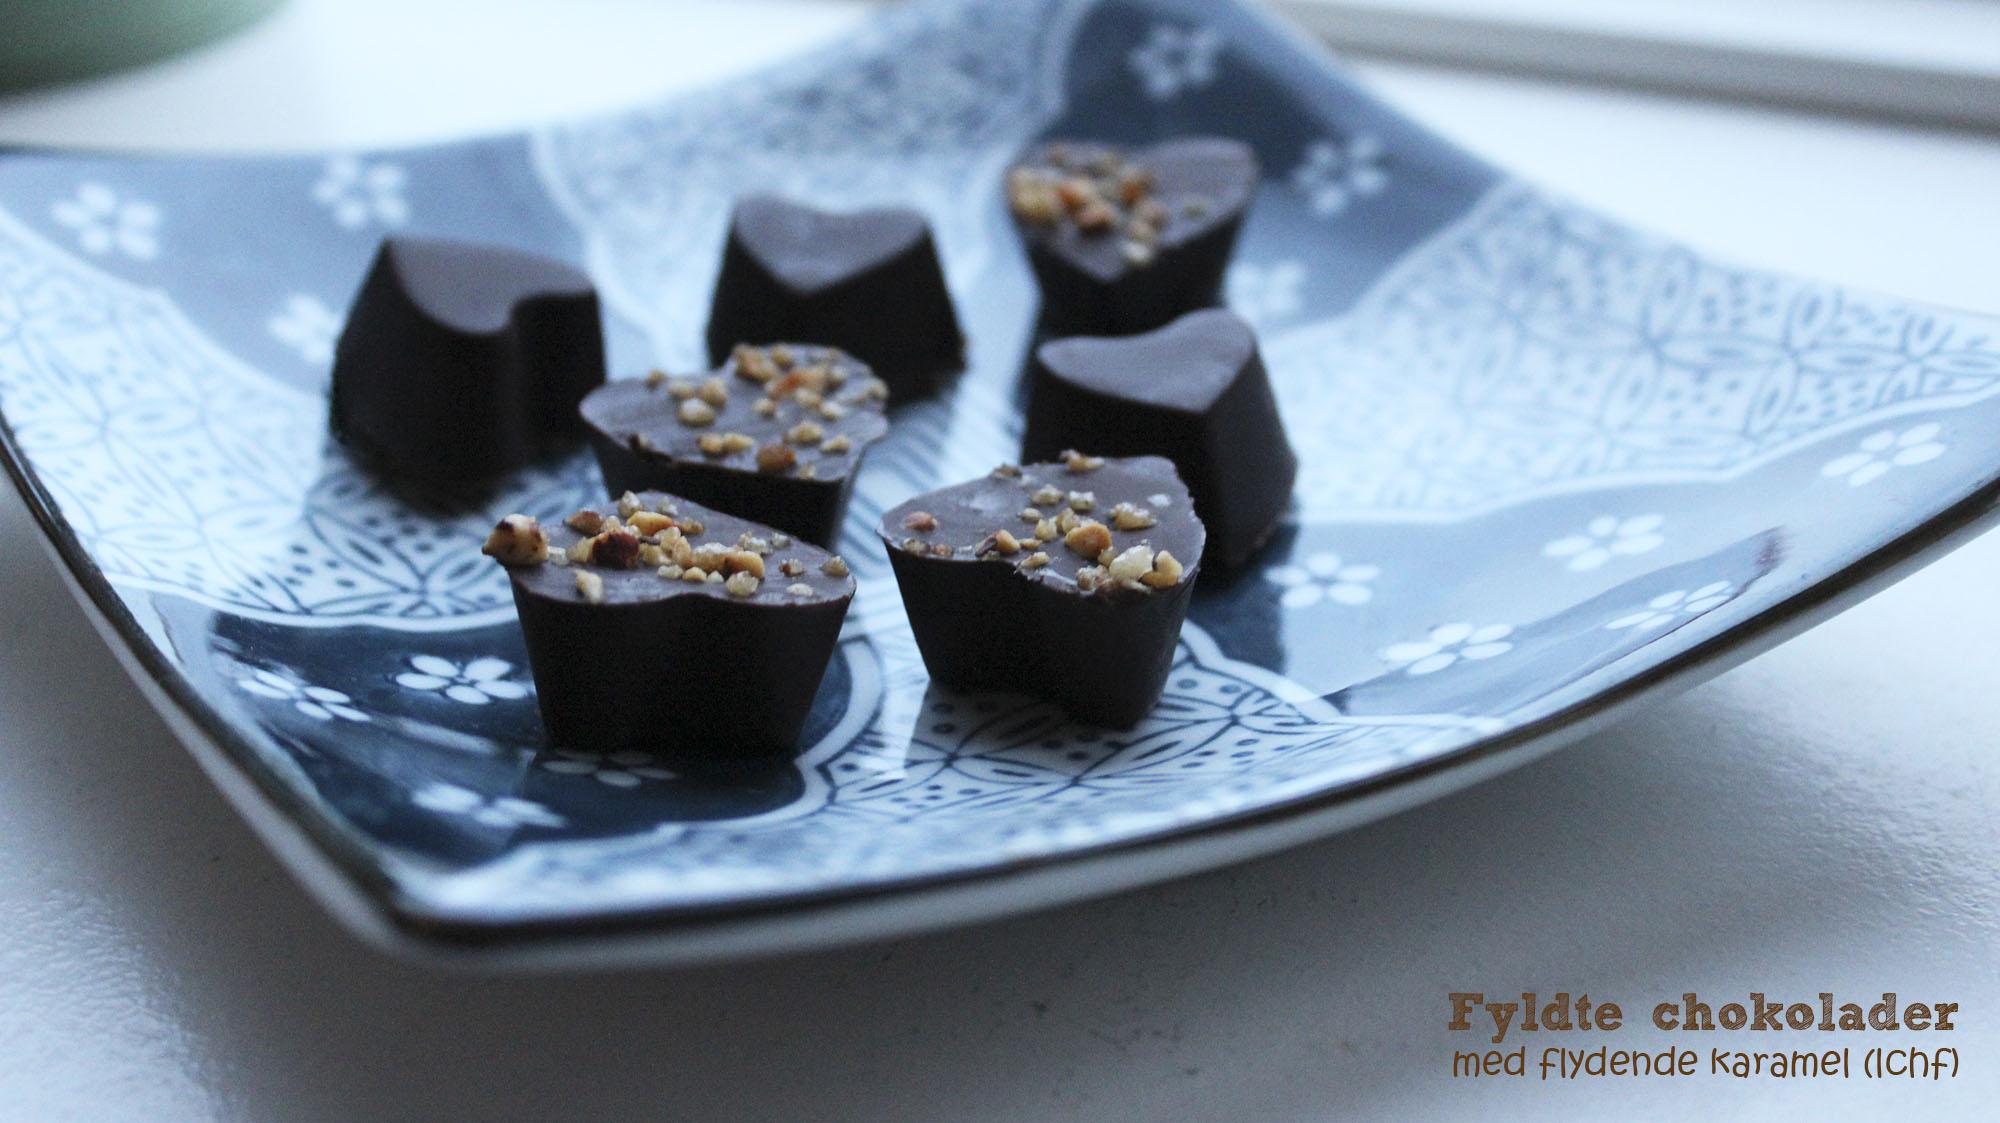 Fyldte chokolader med flydende karamel (lchf)